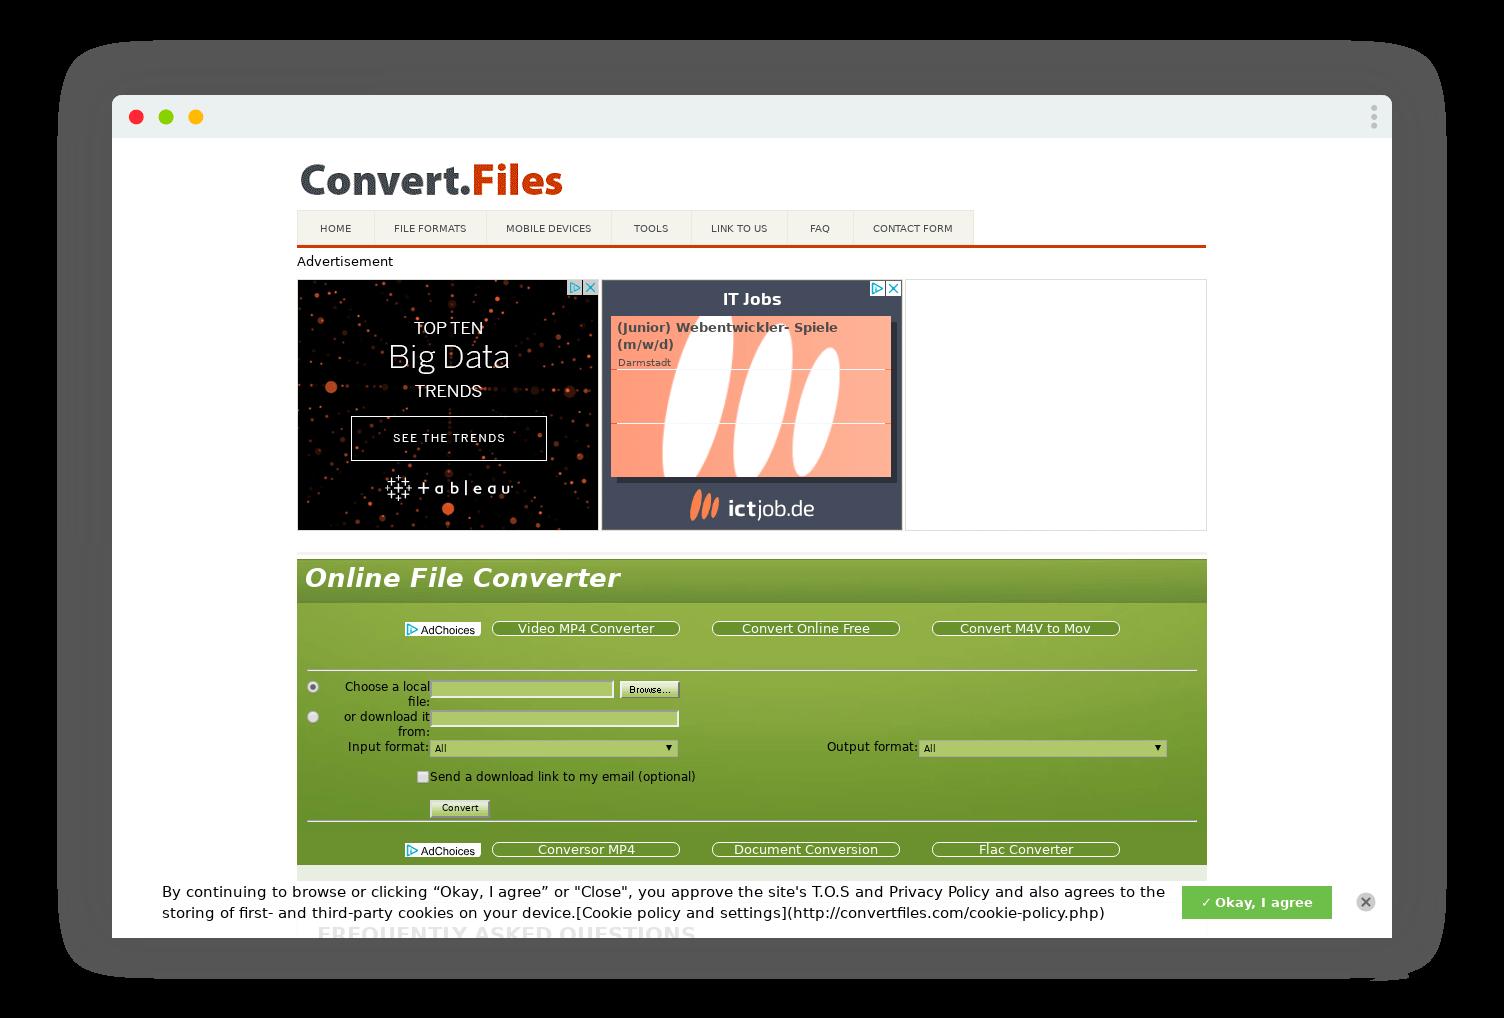 convertfiles conversion format